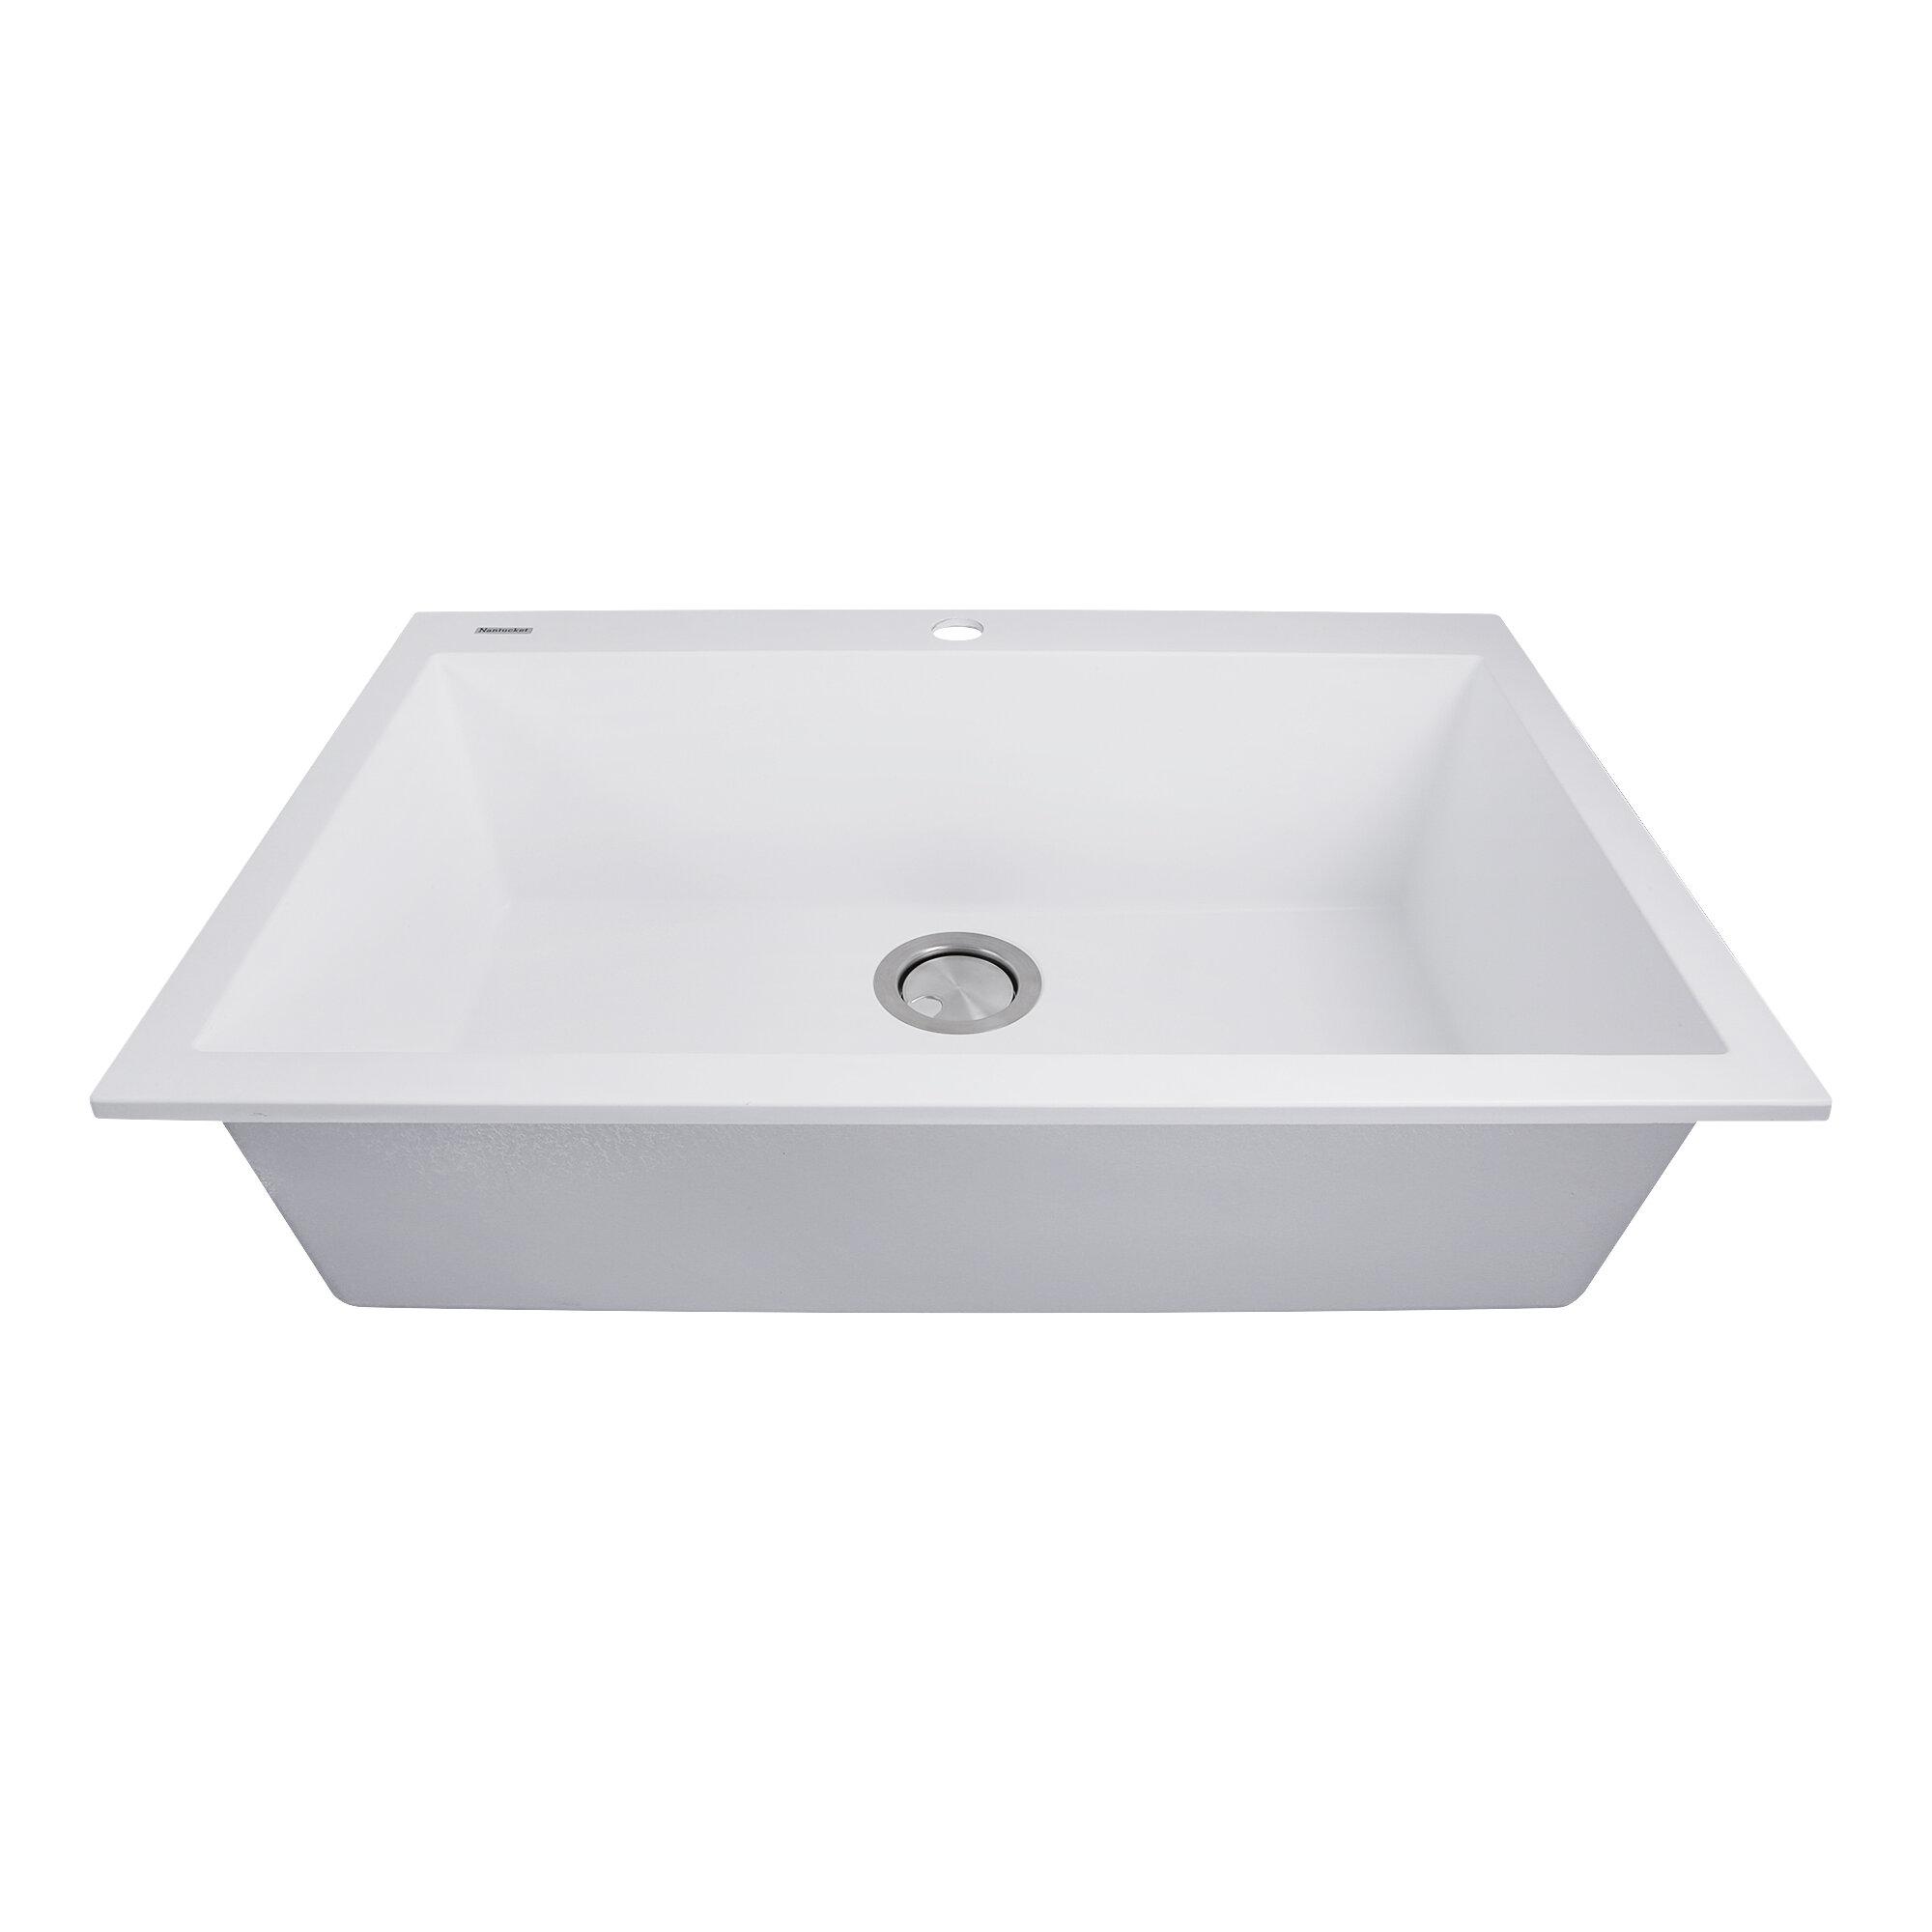 plymouth 30   x 20   drop in kitchen sink  u0026 reviews   allmodern  rh   allmodern com